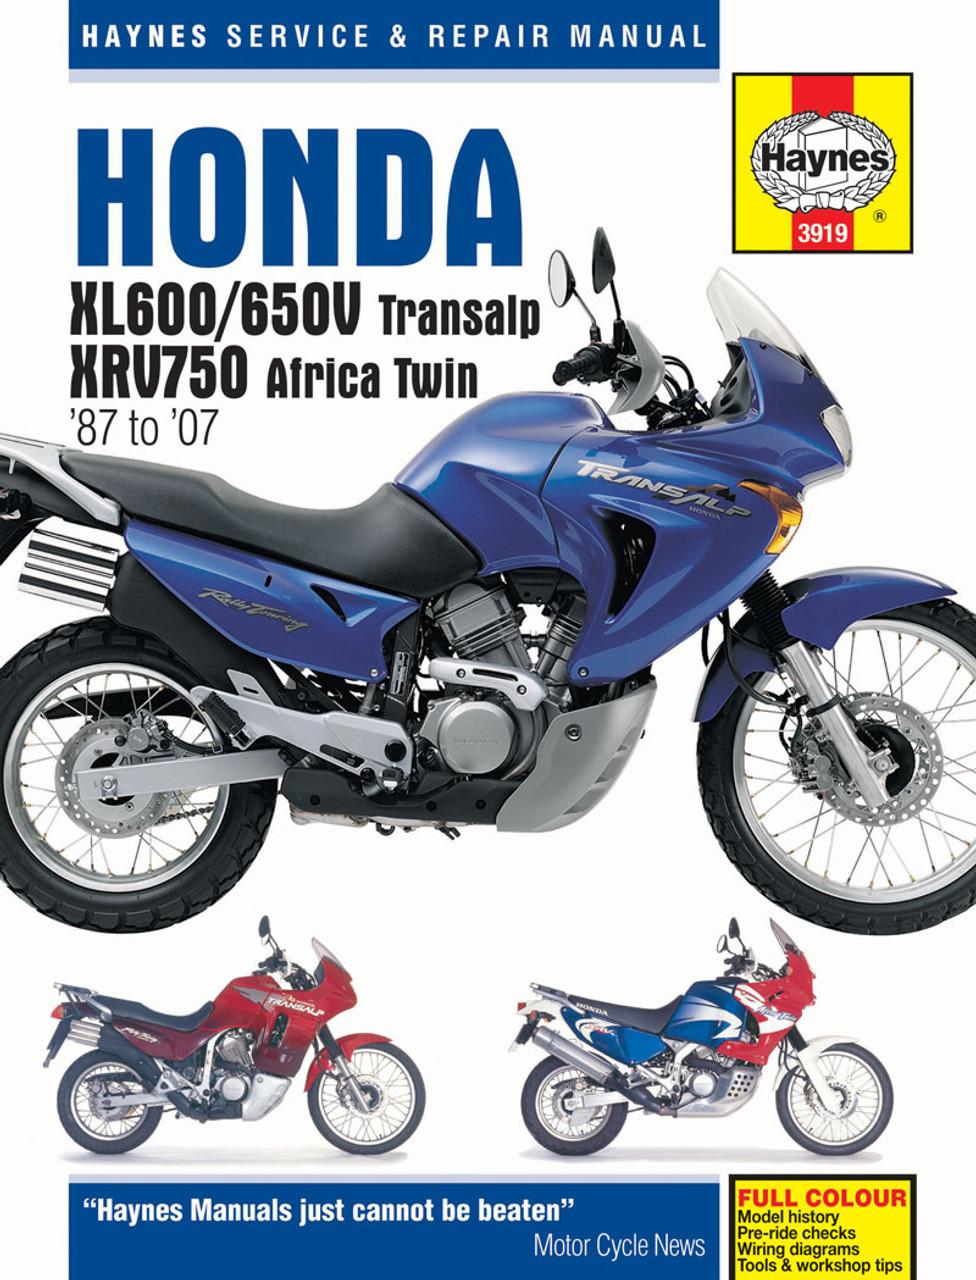 Stupendous Honda Xl600 650V Transalp Xrv750 Africa Twin 1987 2007 Wiring 101 Taclepimsautoservicenl